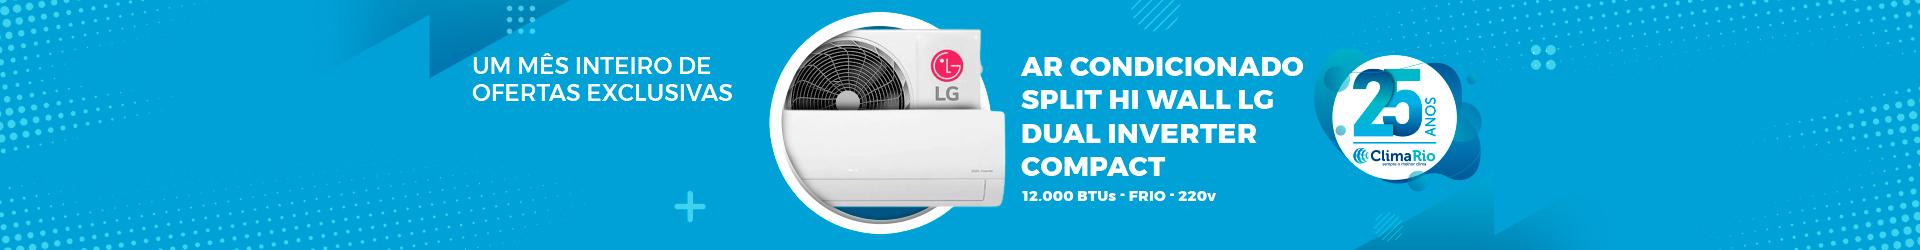 banner_desktop_ar_split_hiwall_LG_dual_inverter_compact